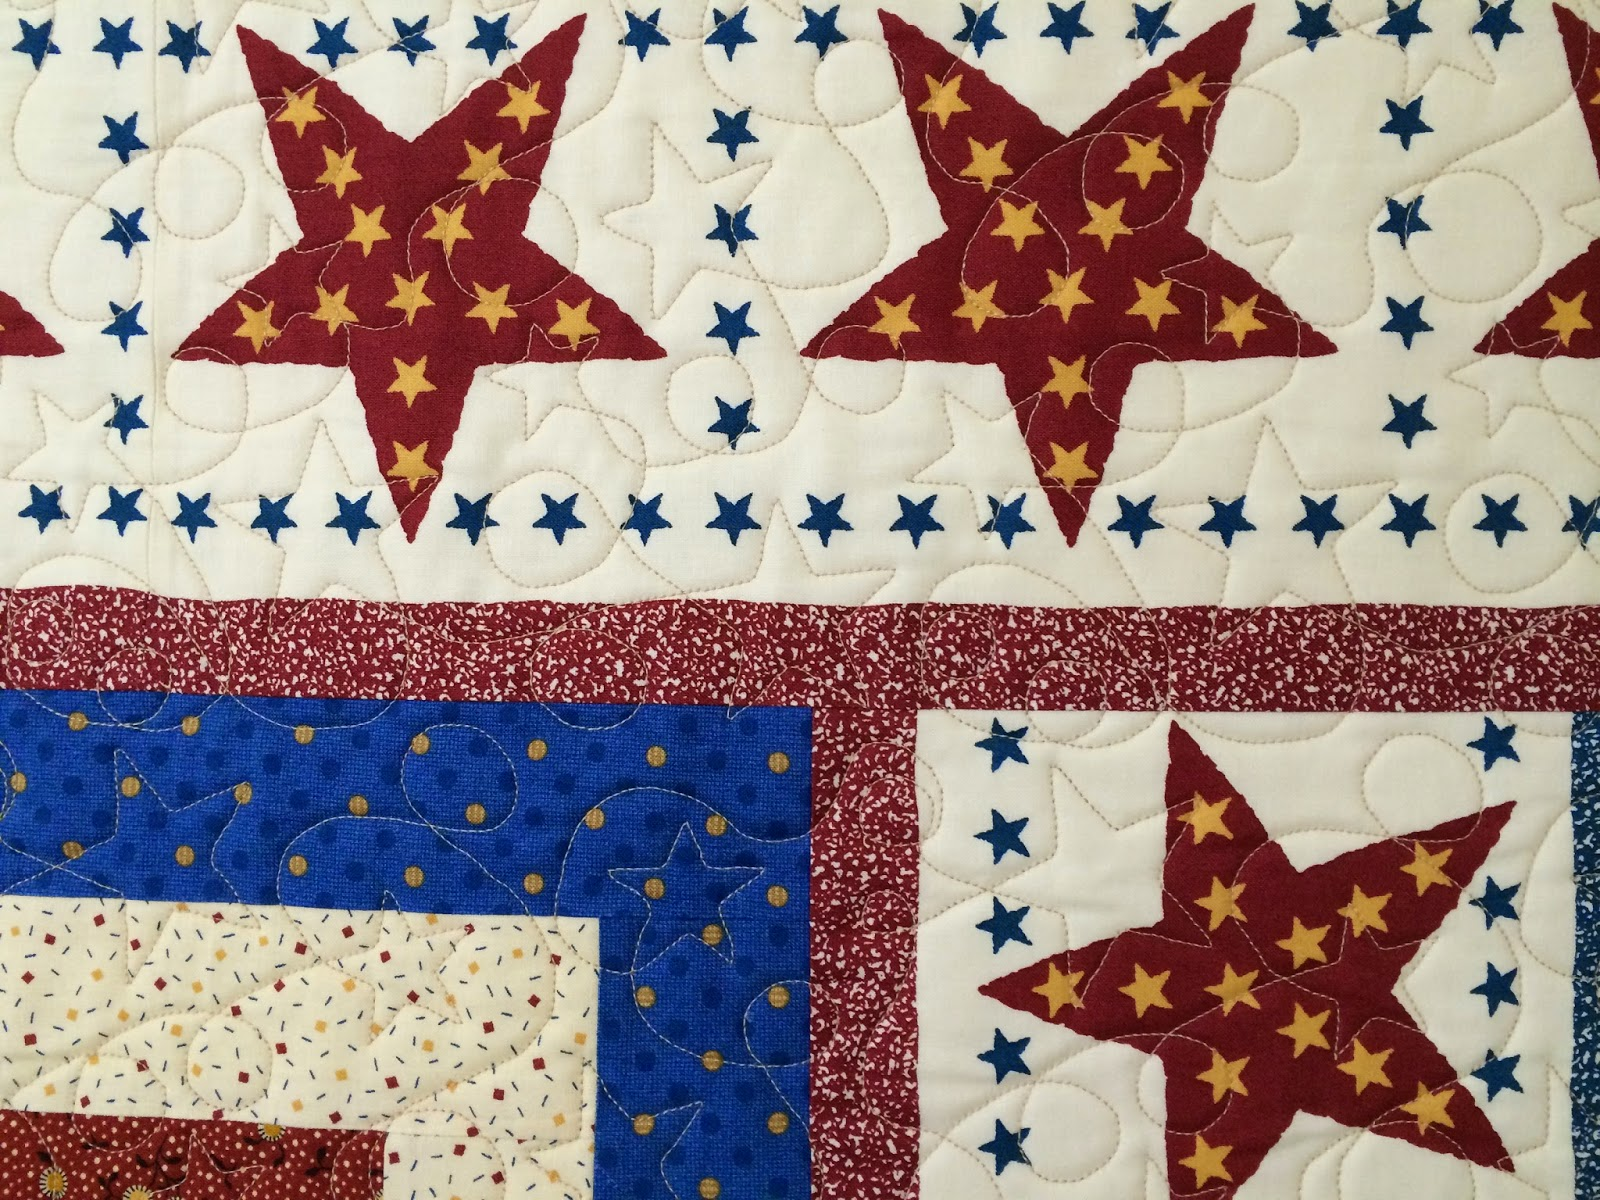 Debbie Taylor's Star Quilt